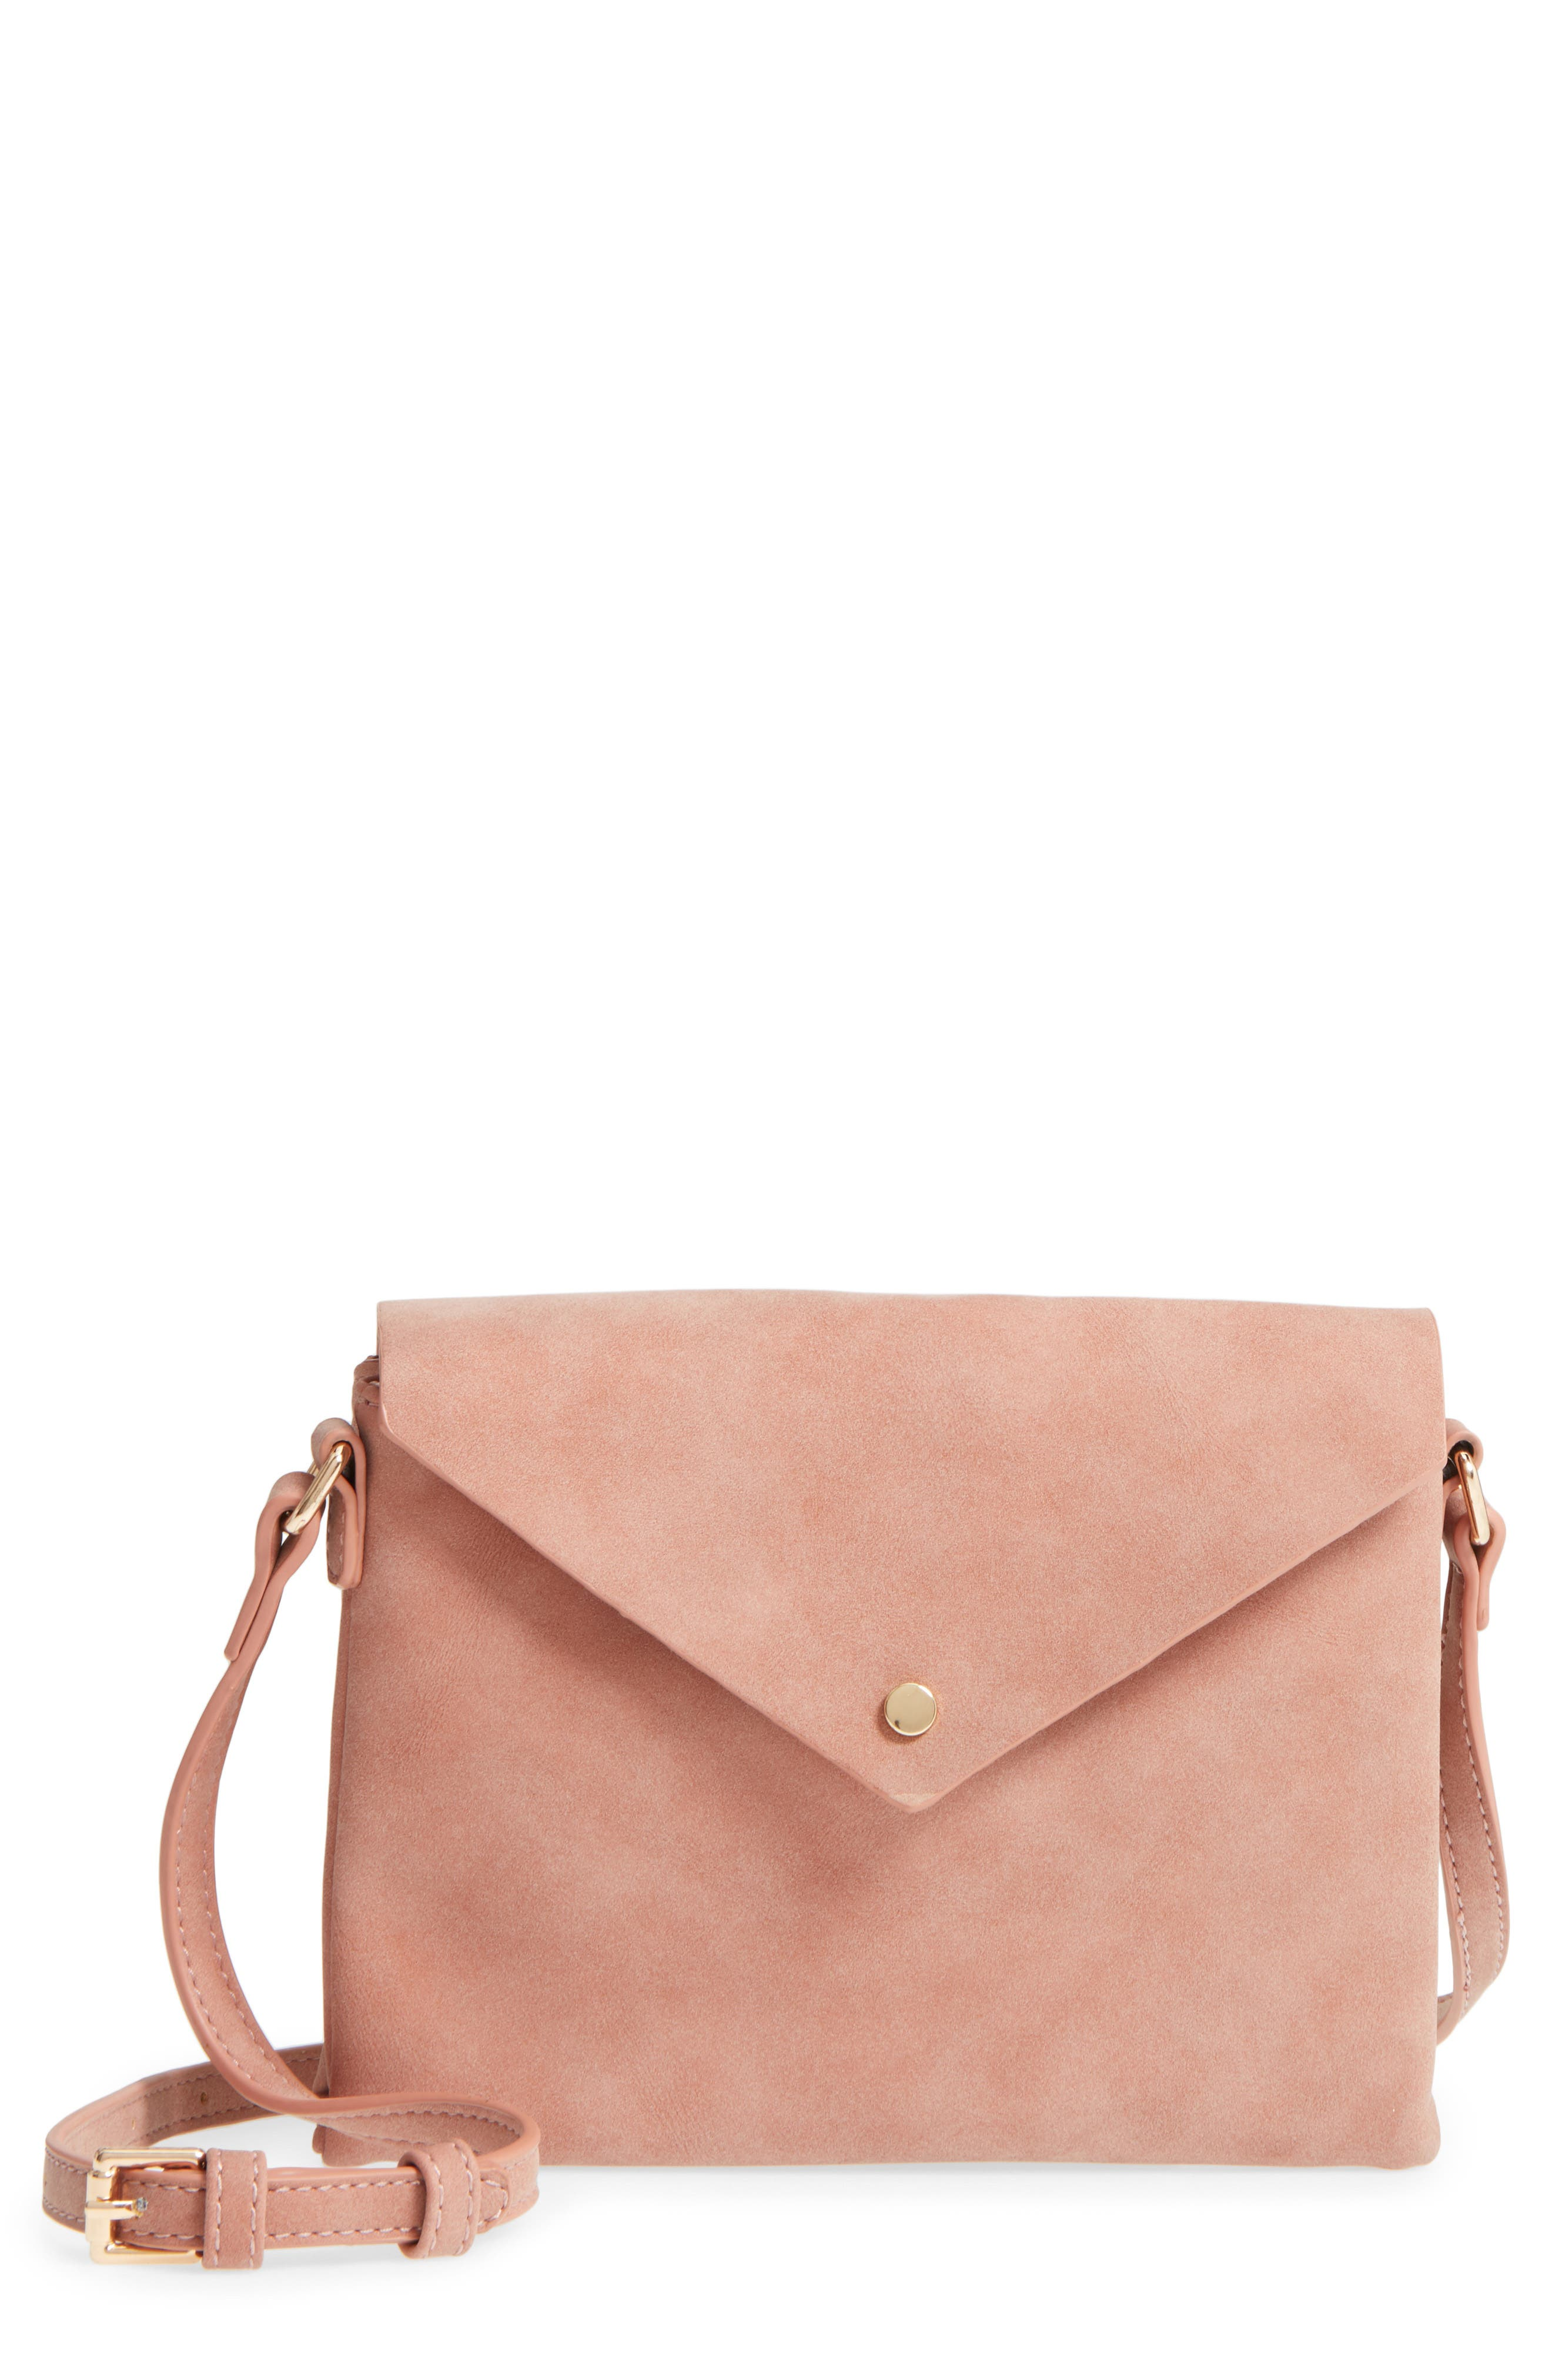 Main Image - Street Level Envelope Crossbody Bag